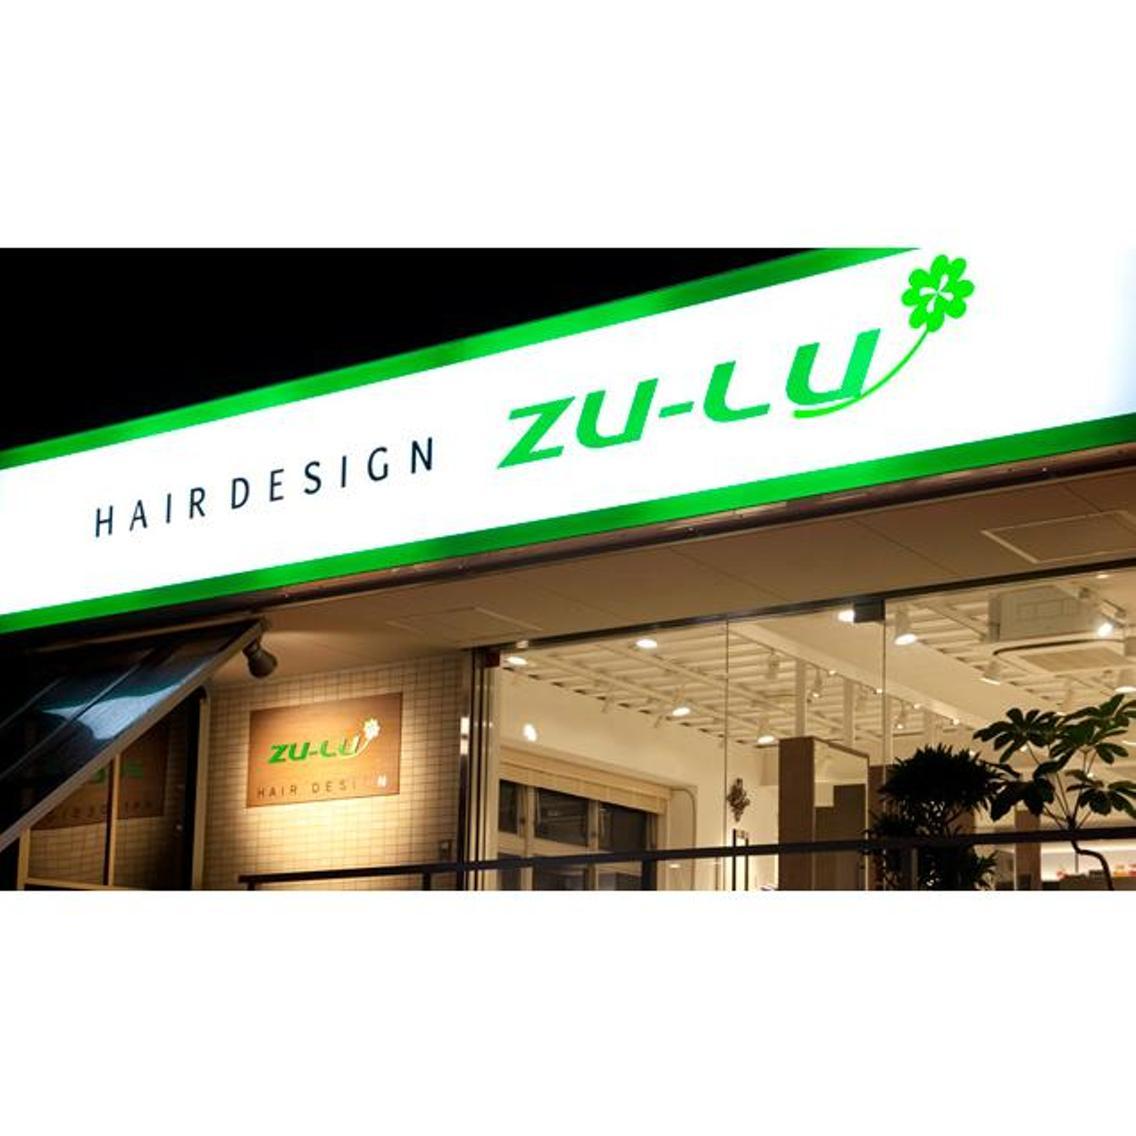 ZU-LU 生田店所属・ヘアデザイン ズールの掲載